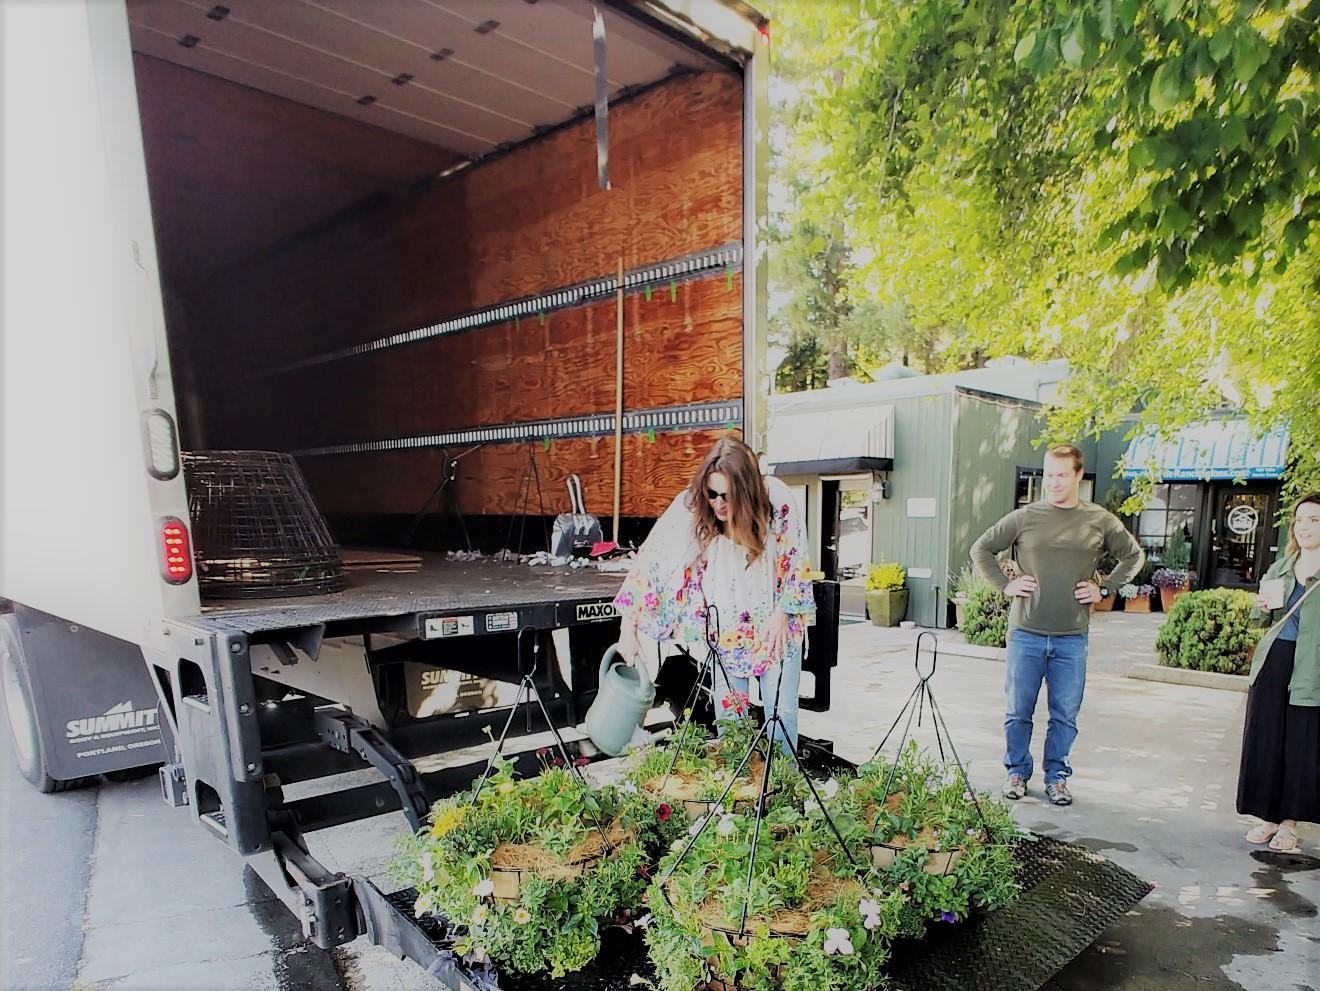 San Anselmo Downtown Gets Beautiful Hanging Flower Baskets Kacey